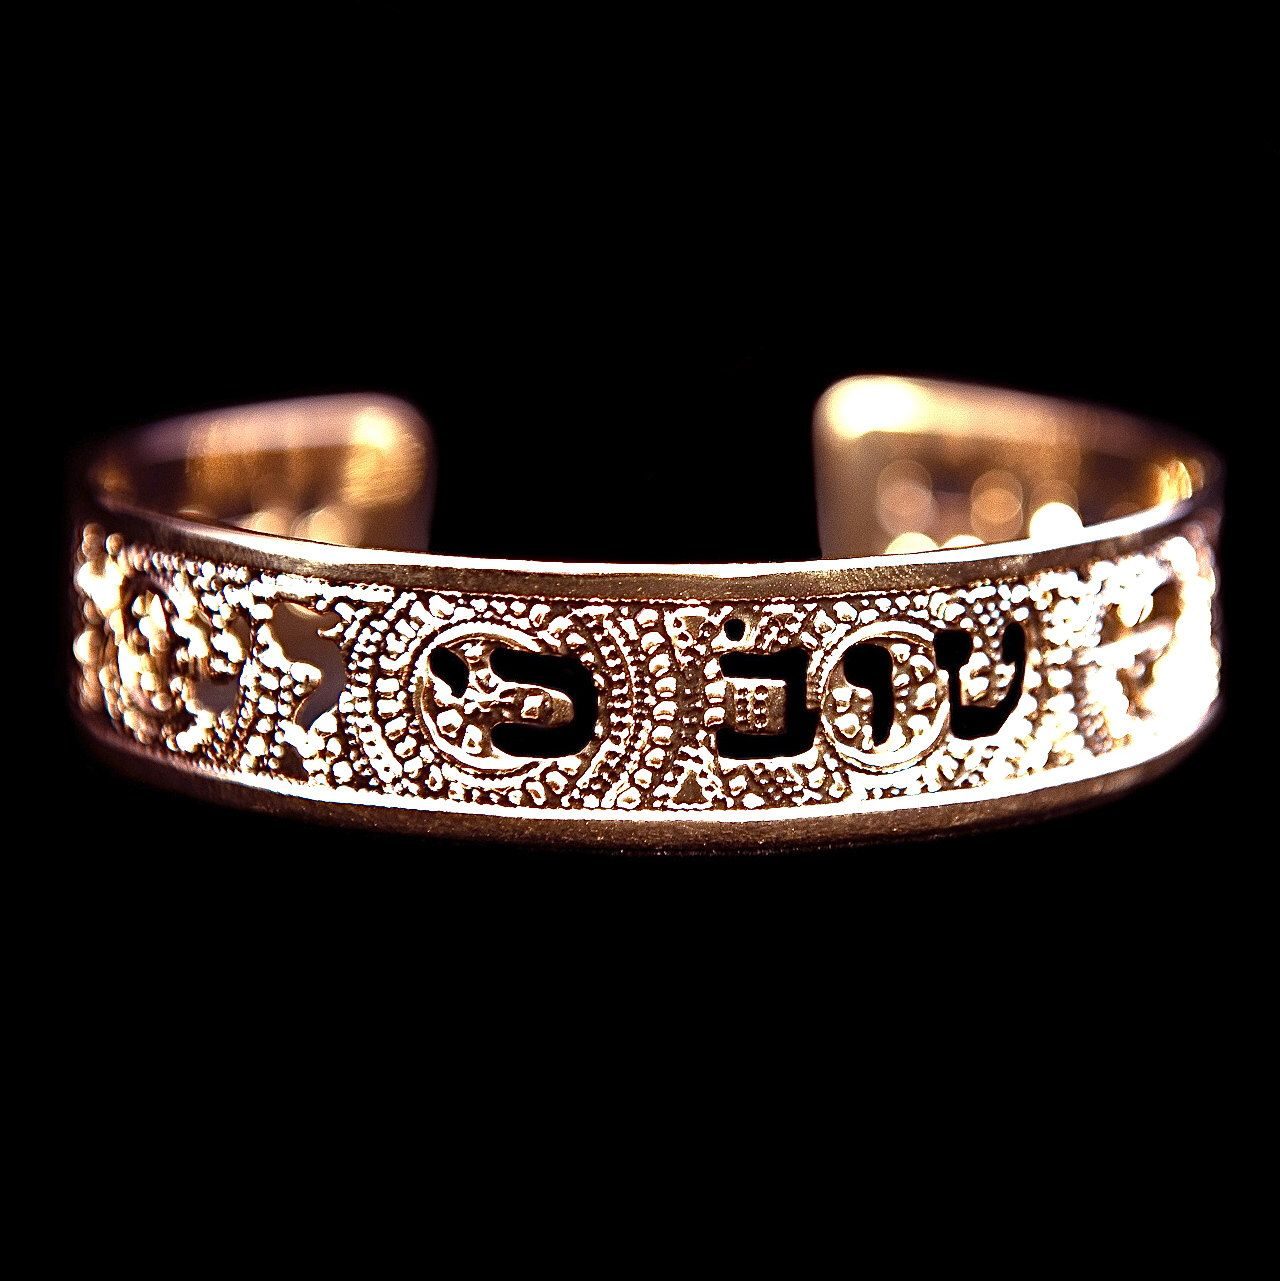 Shema israel bracelet israel bible jewish hebrew prayer kabbalah shma - Judaica Rose Gold Cuff Hebrew Jewelry Rose Gold Cuff Spiritual Jewelry Psalms